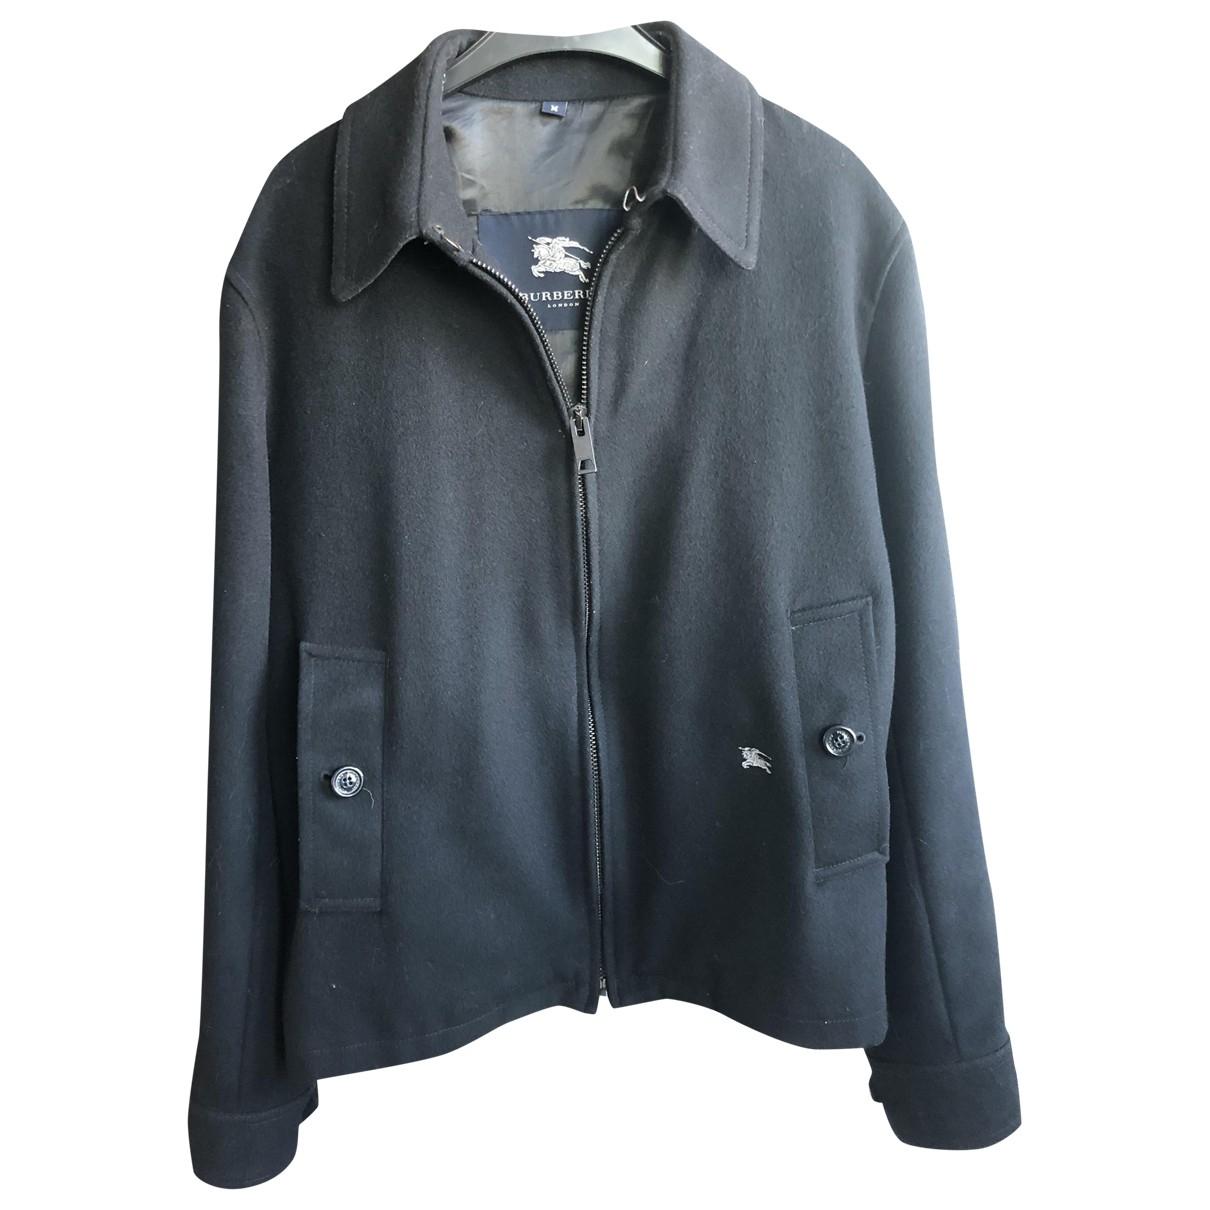 Burberry \N Navy Cotton jacket  for Men M International